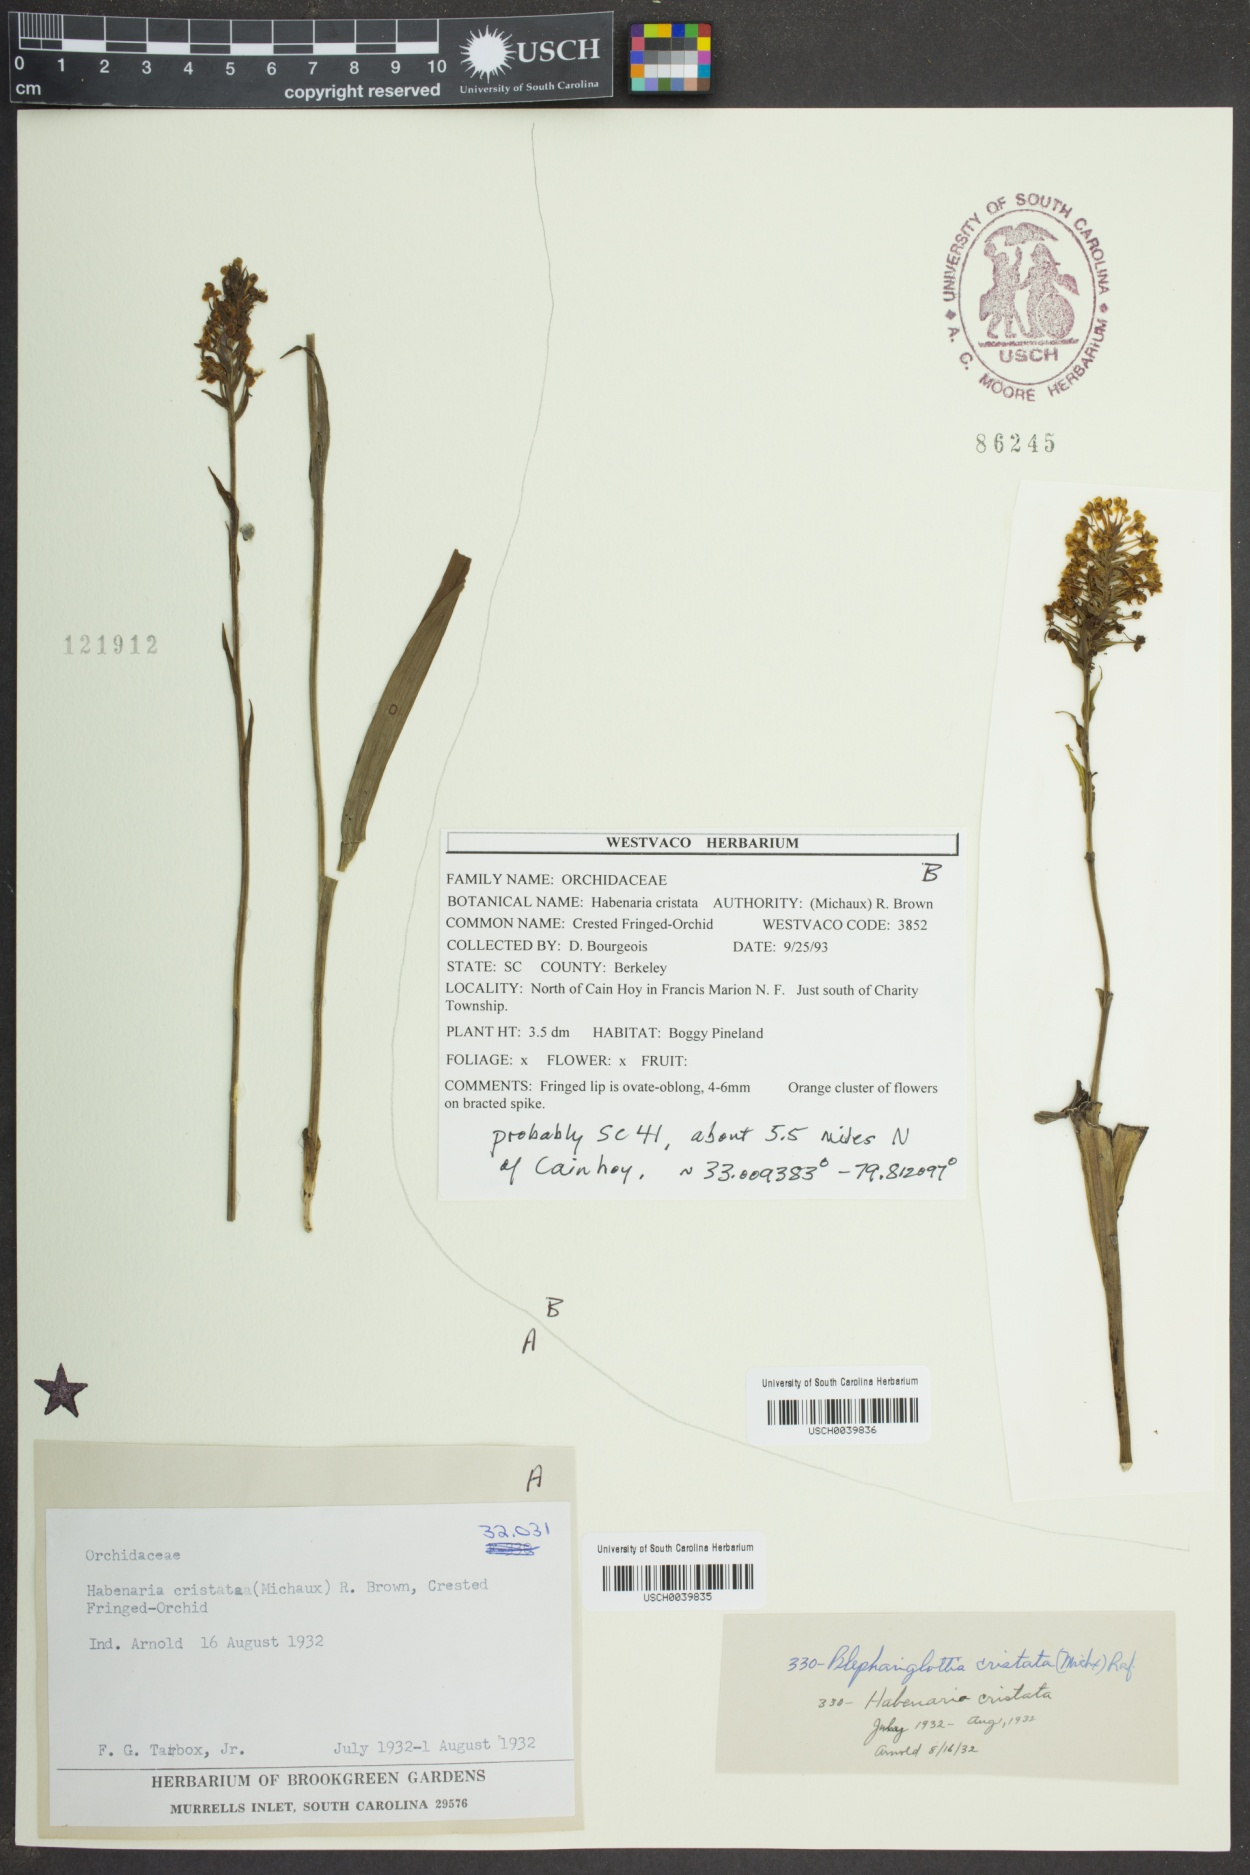 Blephariglotis cristata image